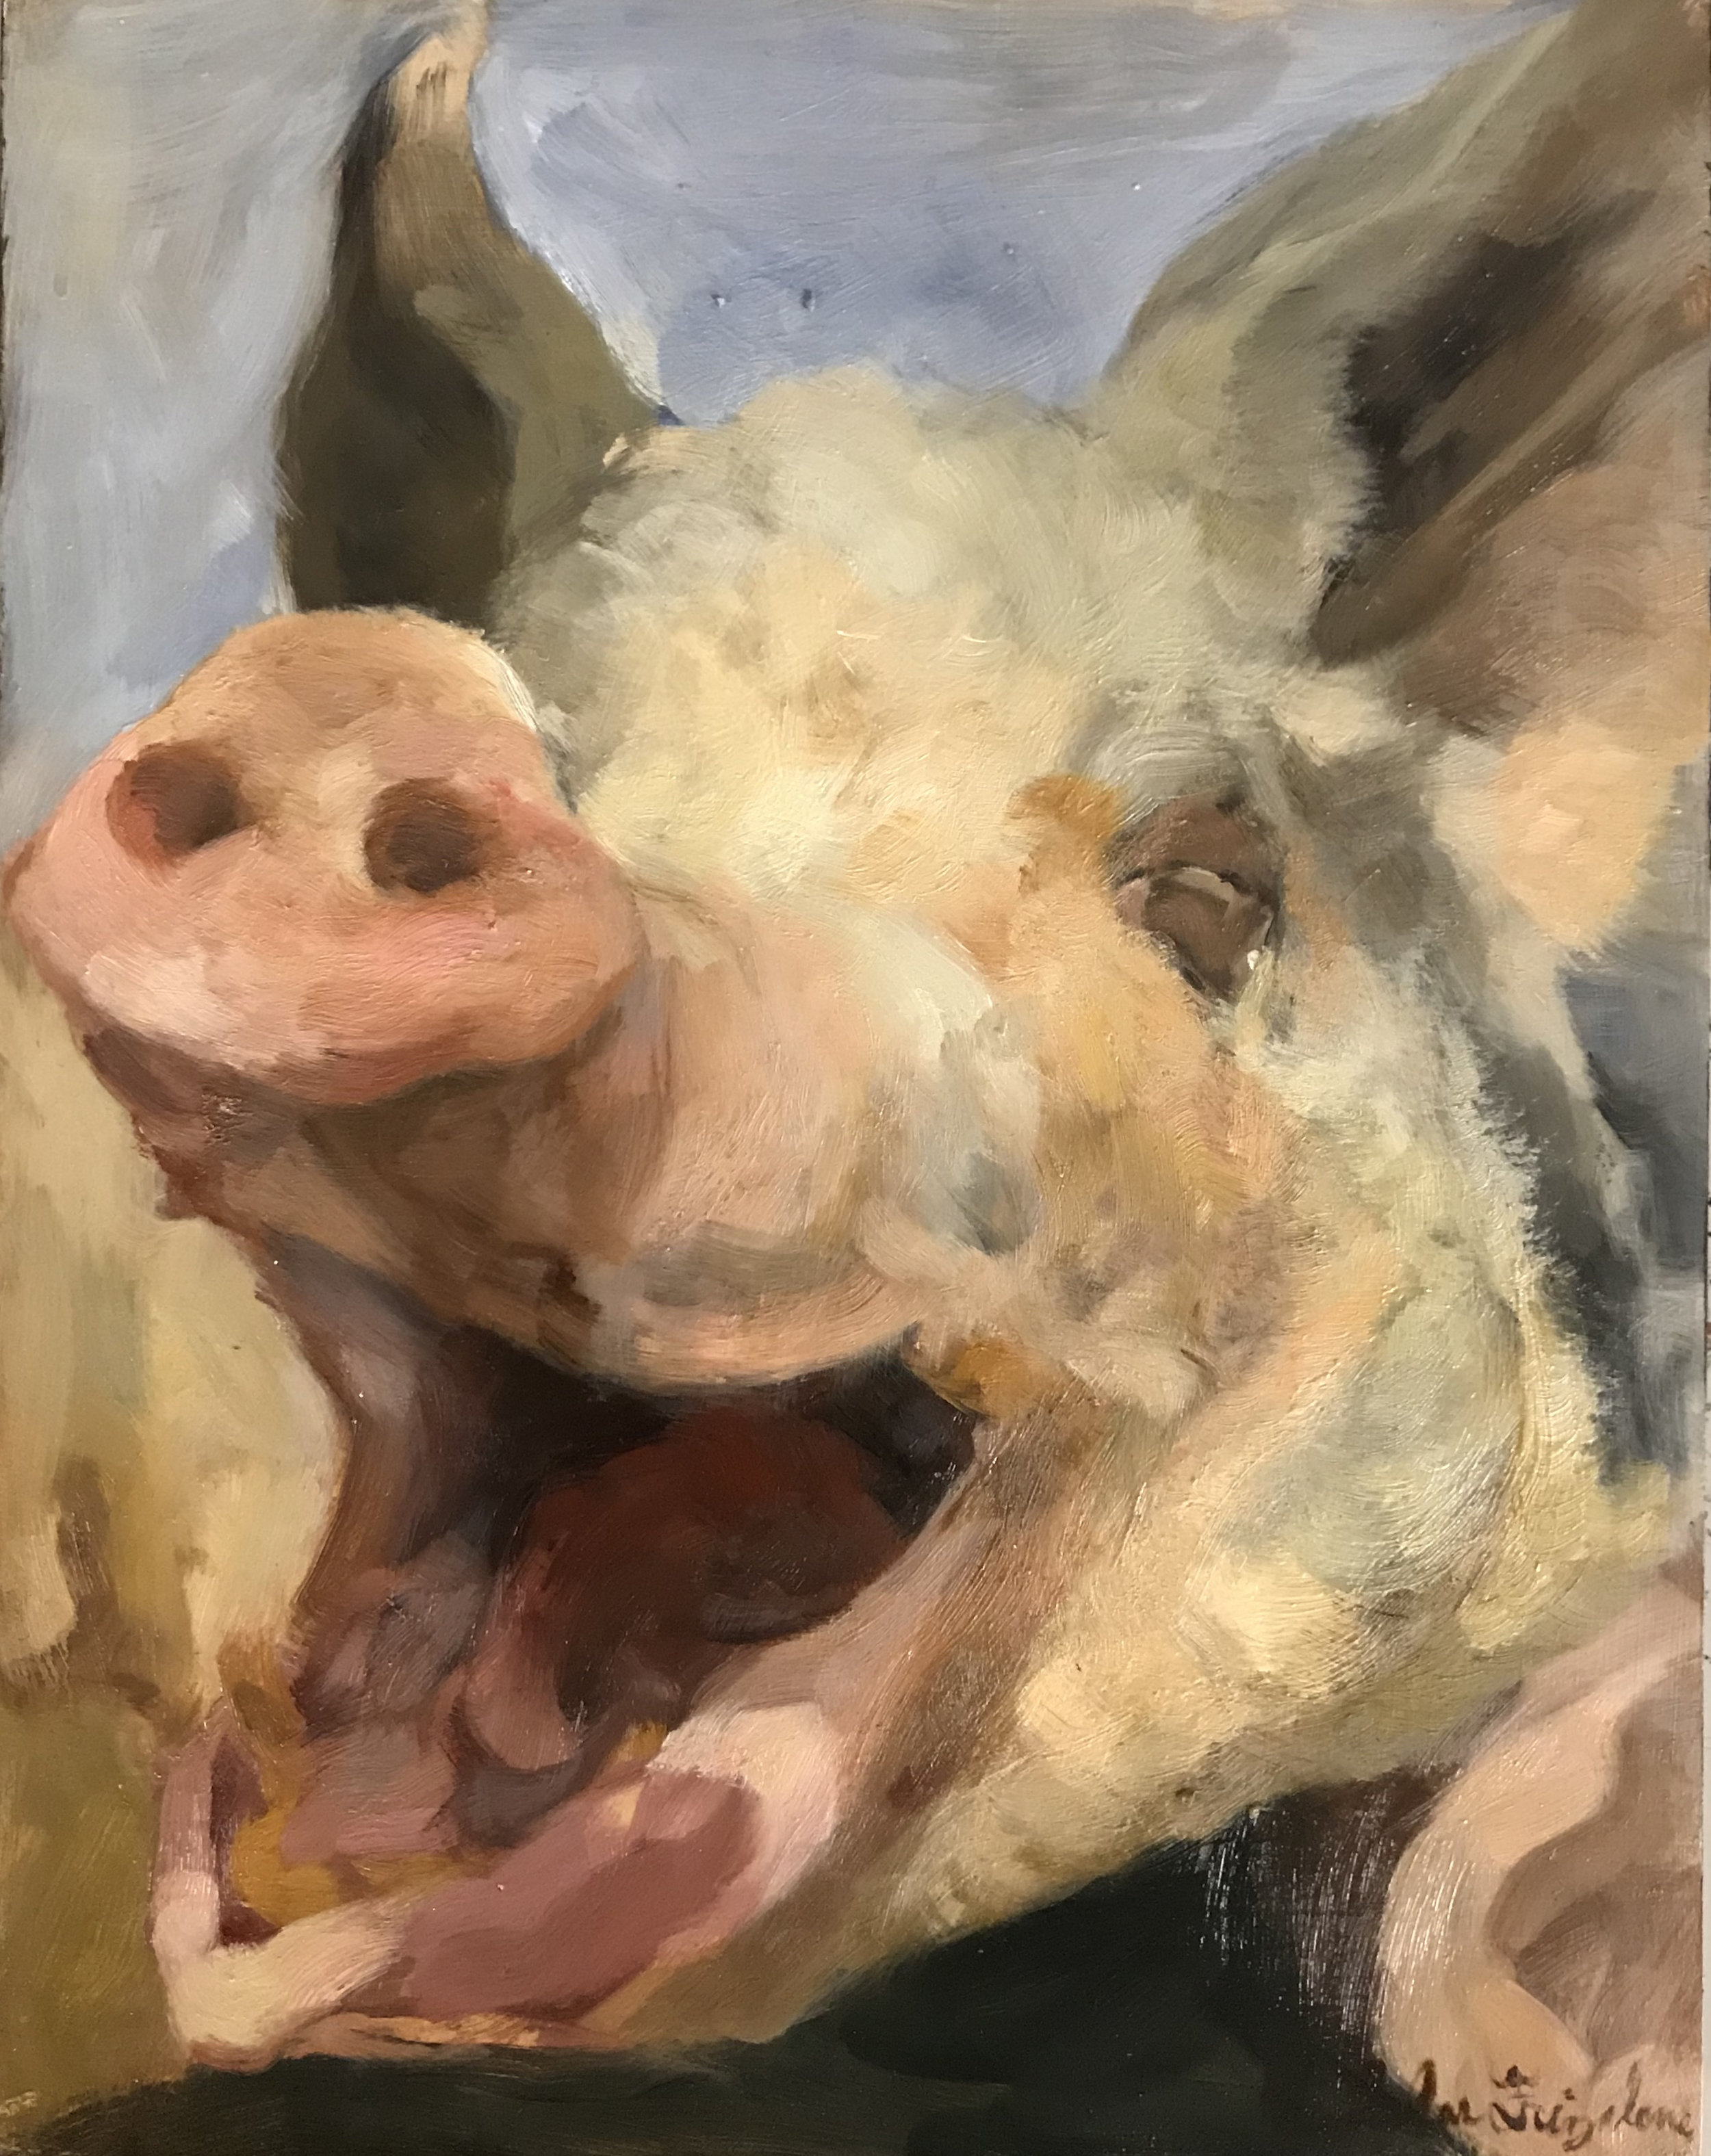 Blissful Hog